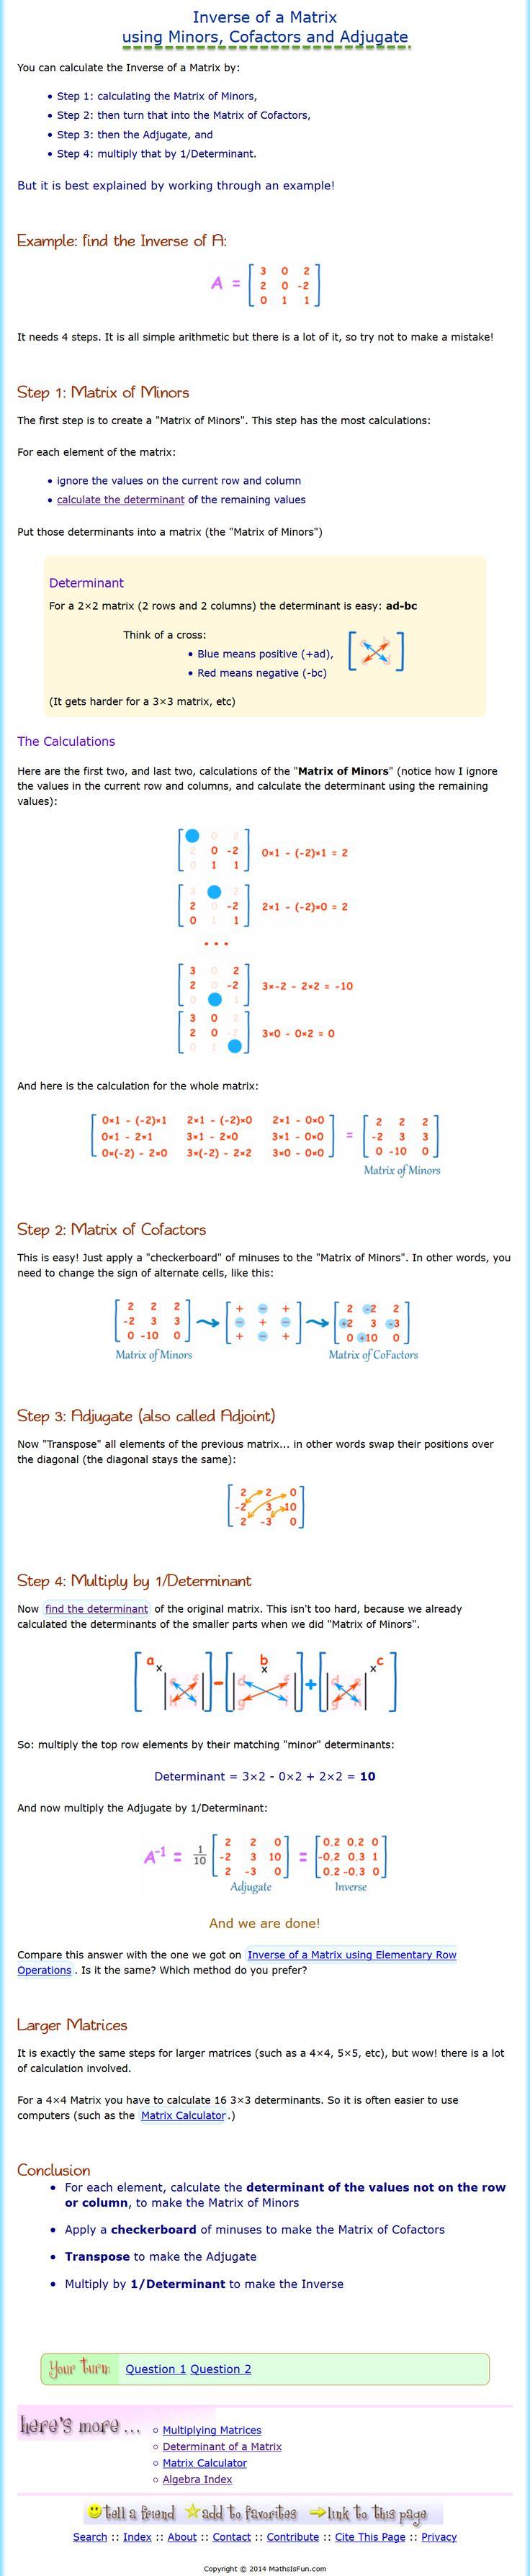 Inverses of Matrices